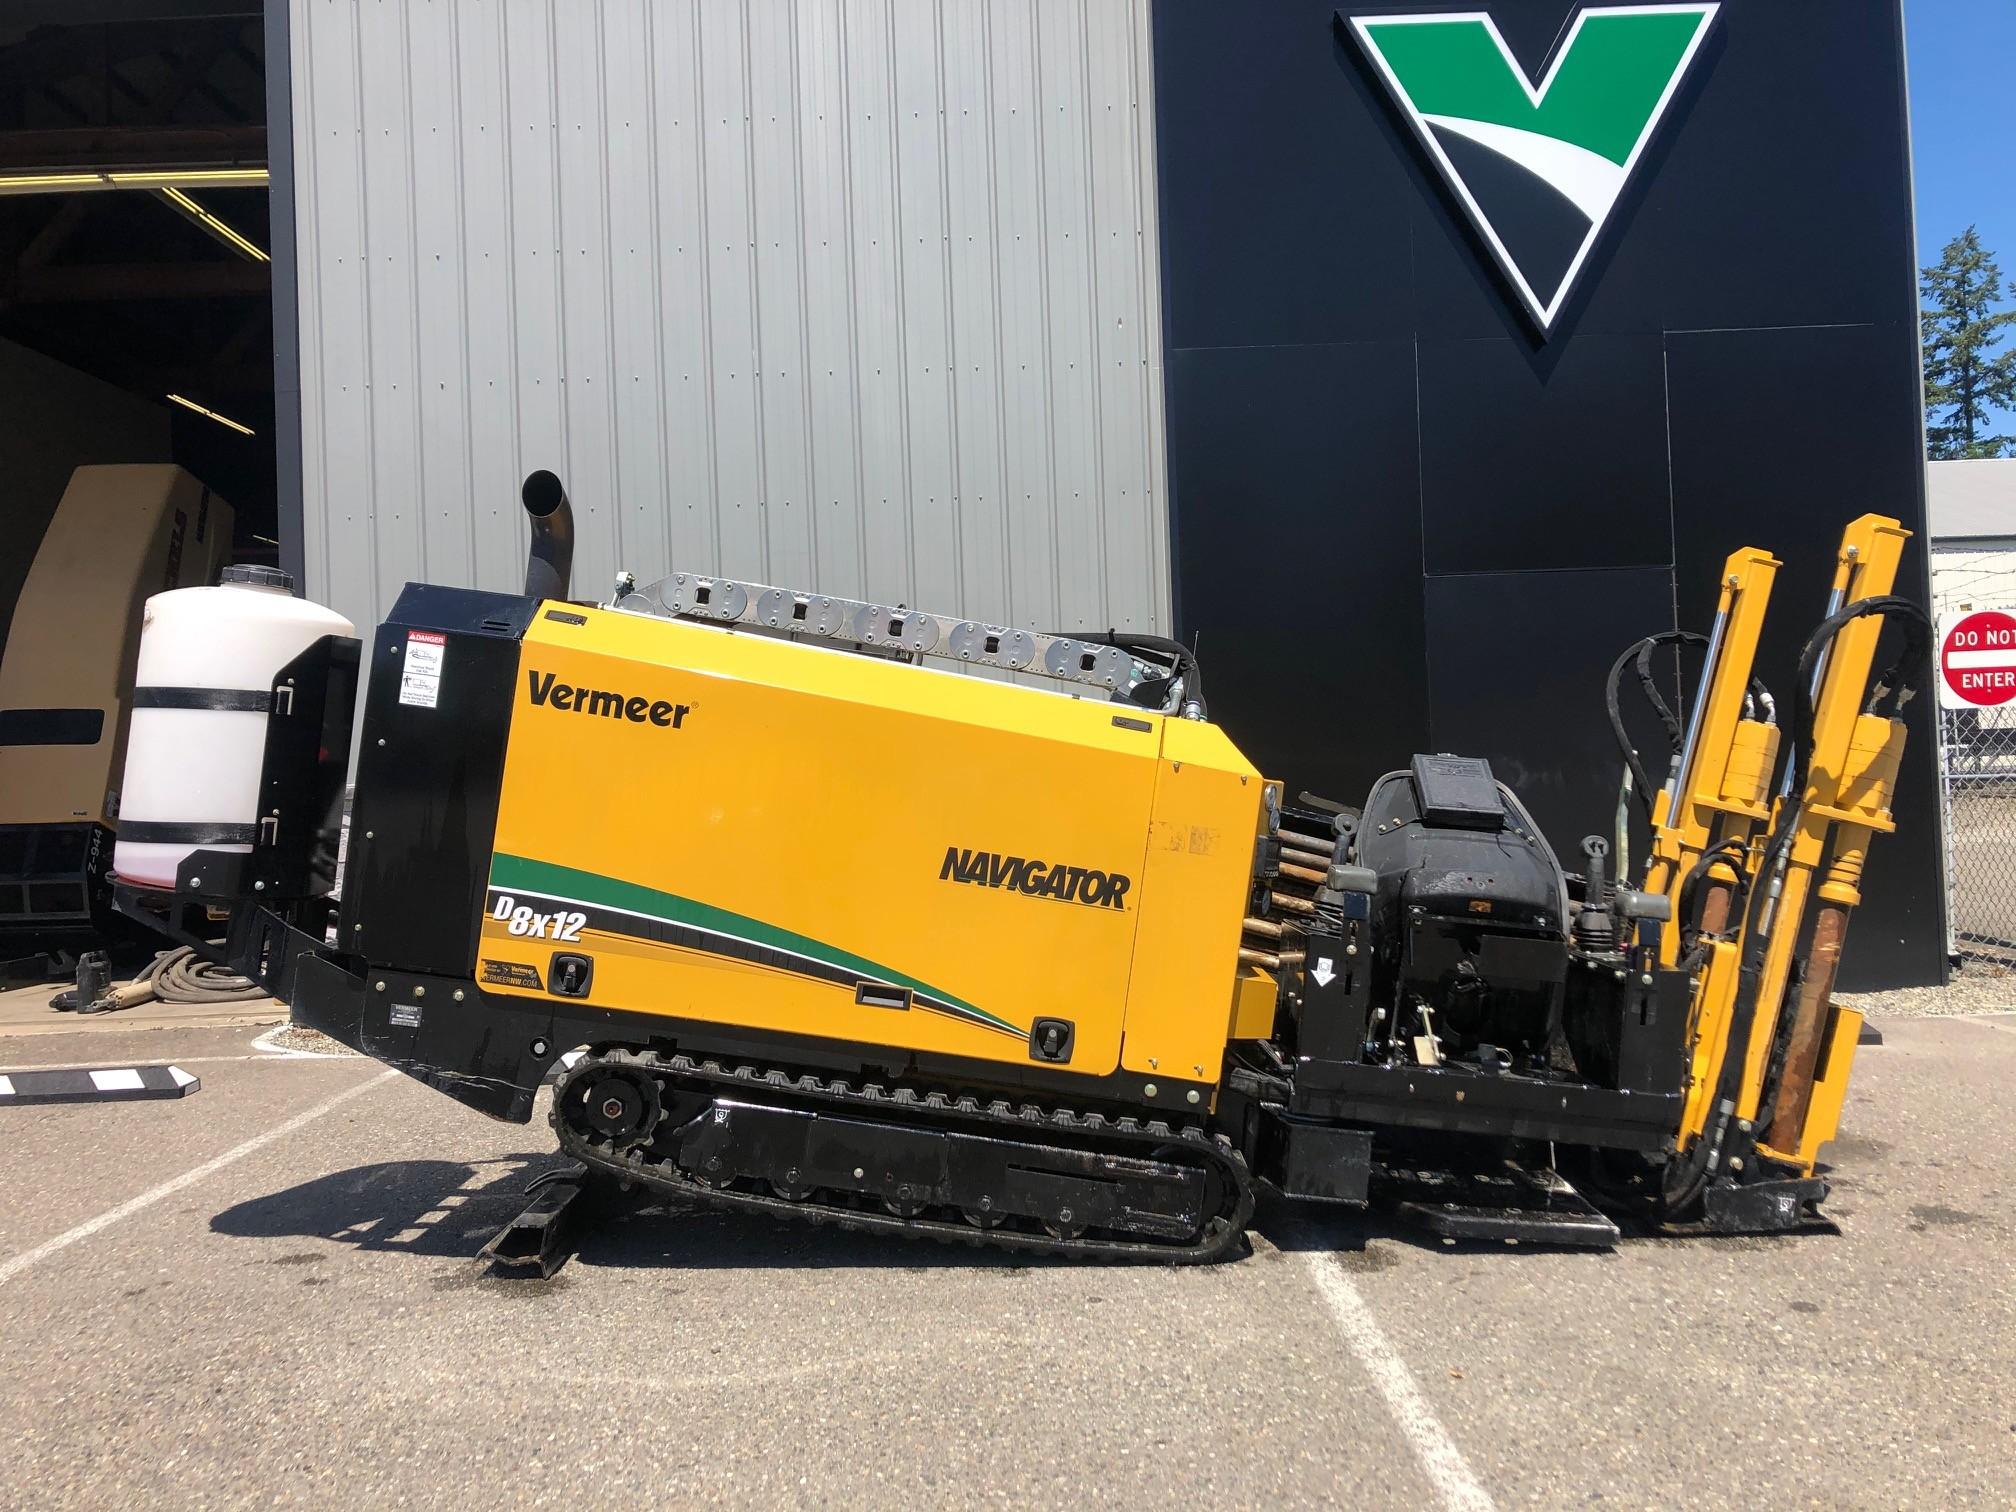 Used, 2018, Vermeer, D8x12, Boring / Drilling Machines